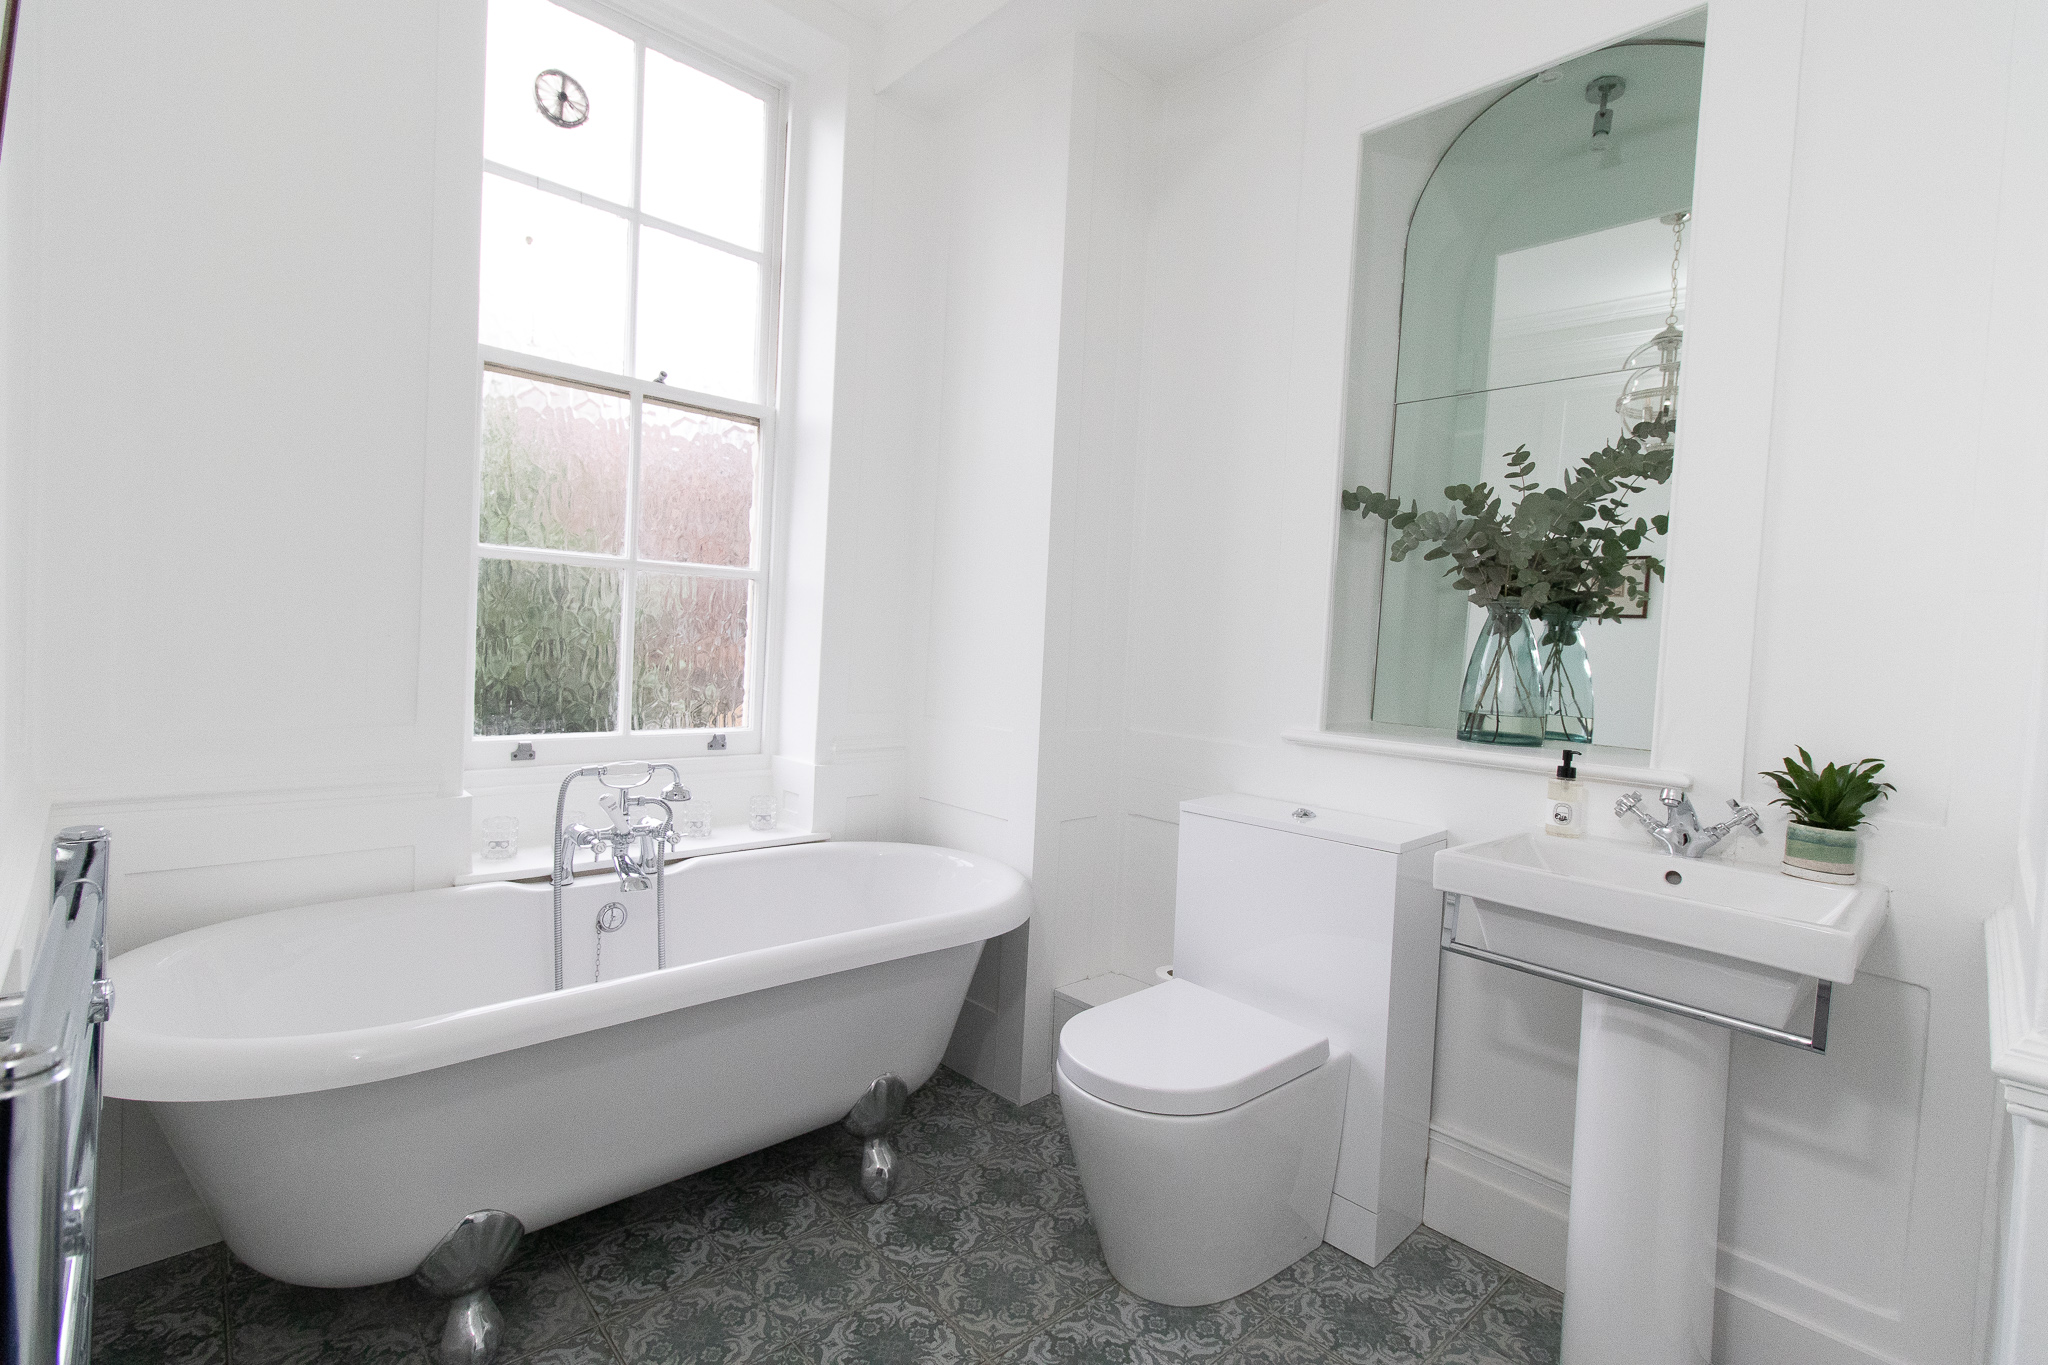 WHITE BATHROOM, CLAWFOOT BATHTUB, GREY TILE, PRSTIGE BUILD, RENOVATION.jpg